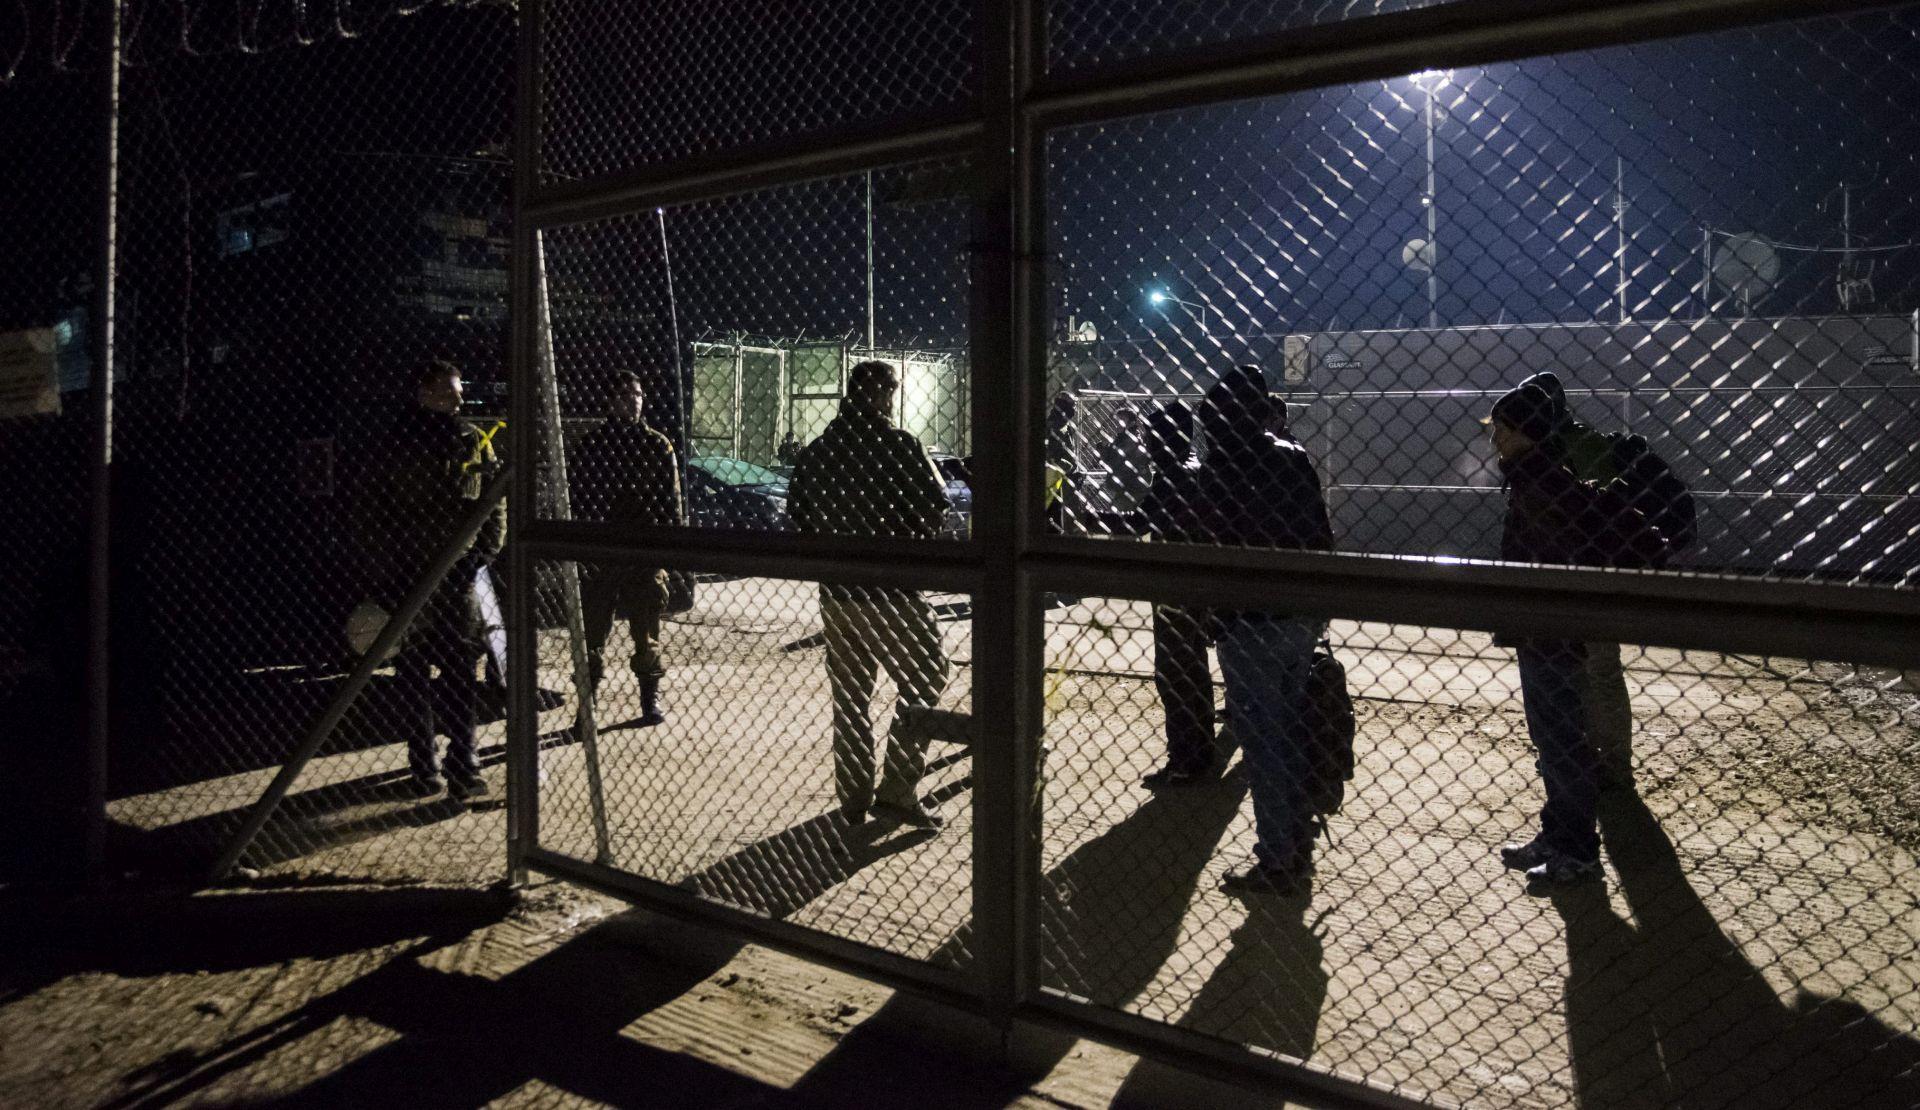 SLUŽBENA OPOMENA: EK pokreće postupak protiv Mađarske zbog zakona o azilu